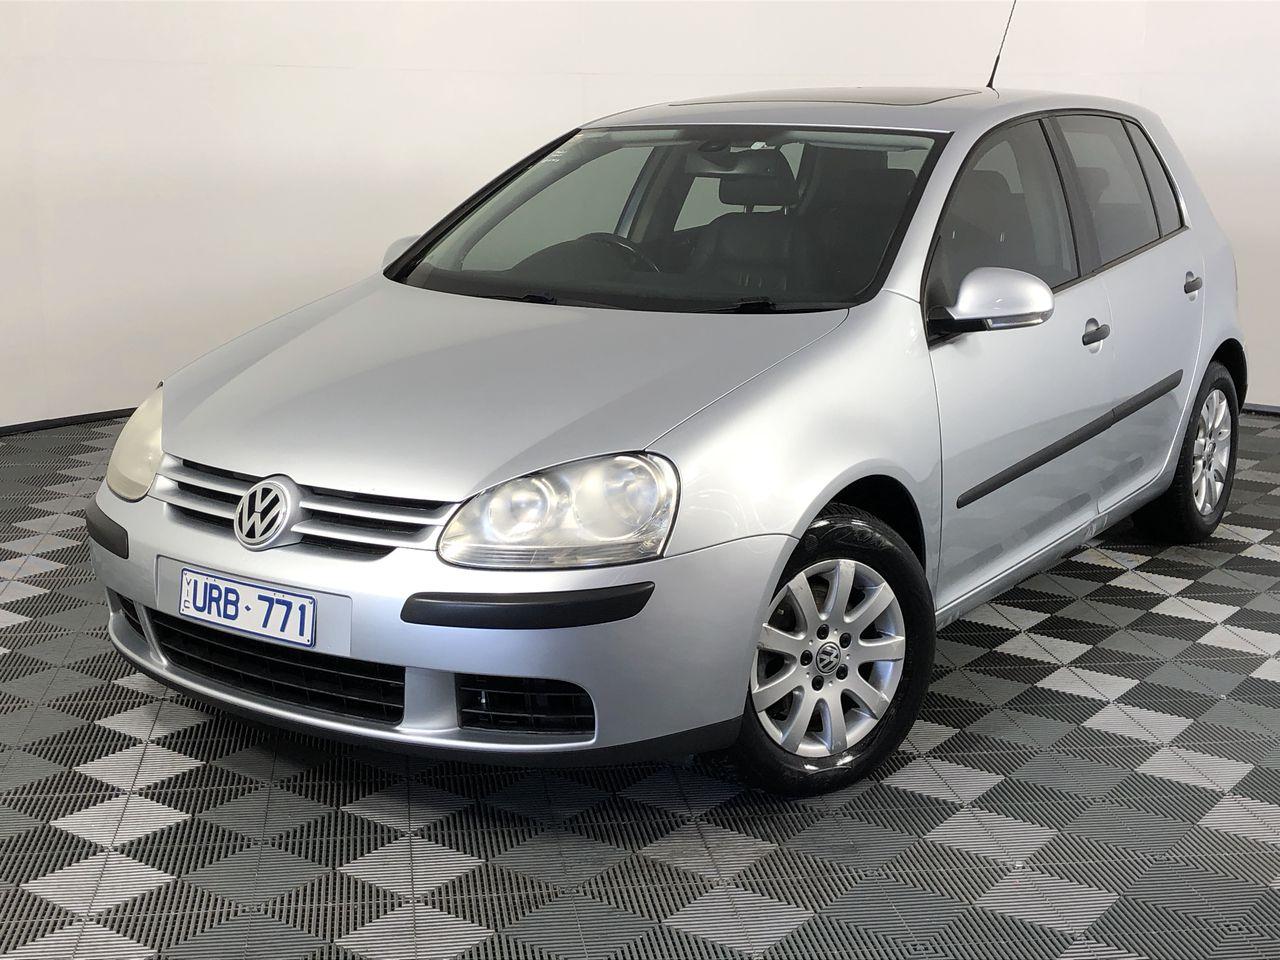 2007 Volkswagen Golf 2.0 TDI Comfortline A5 Automatic Hatchback